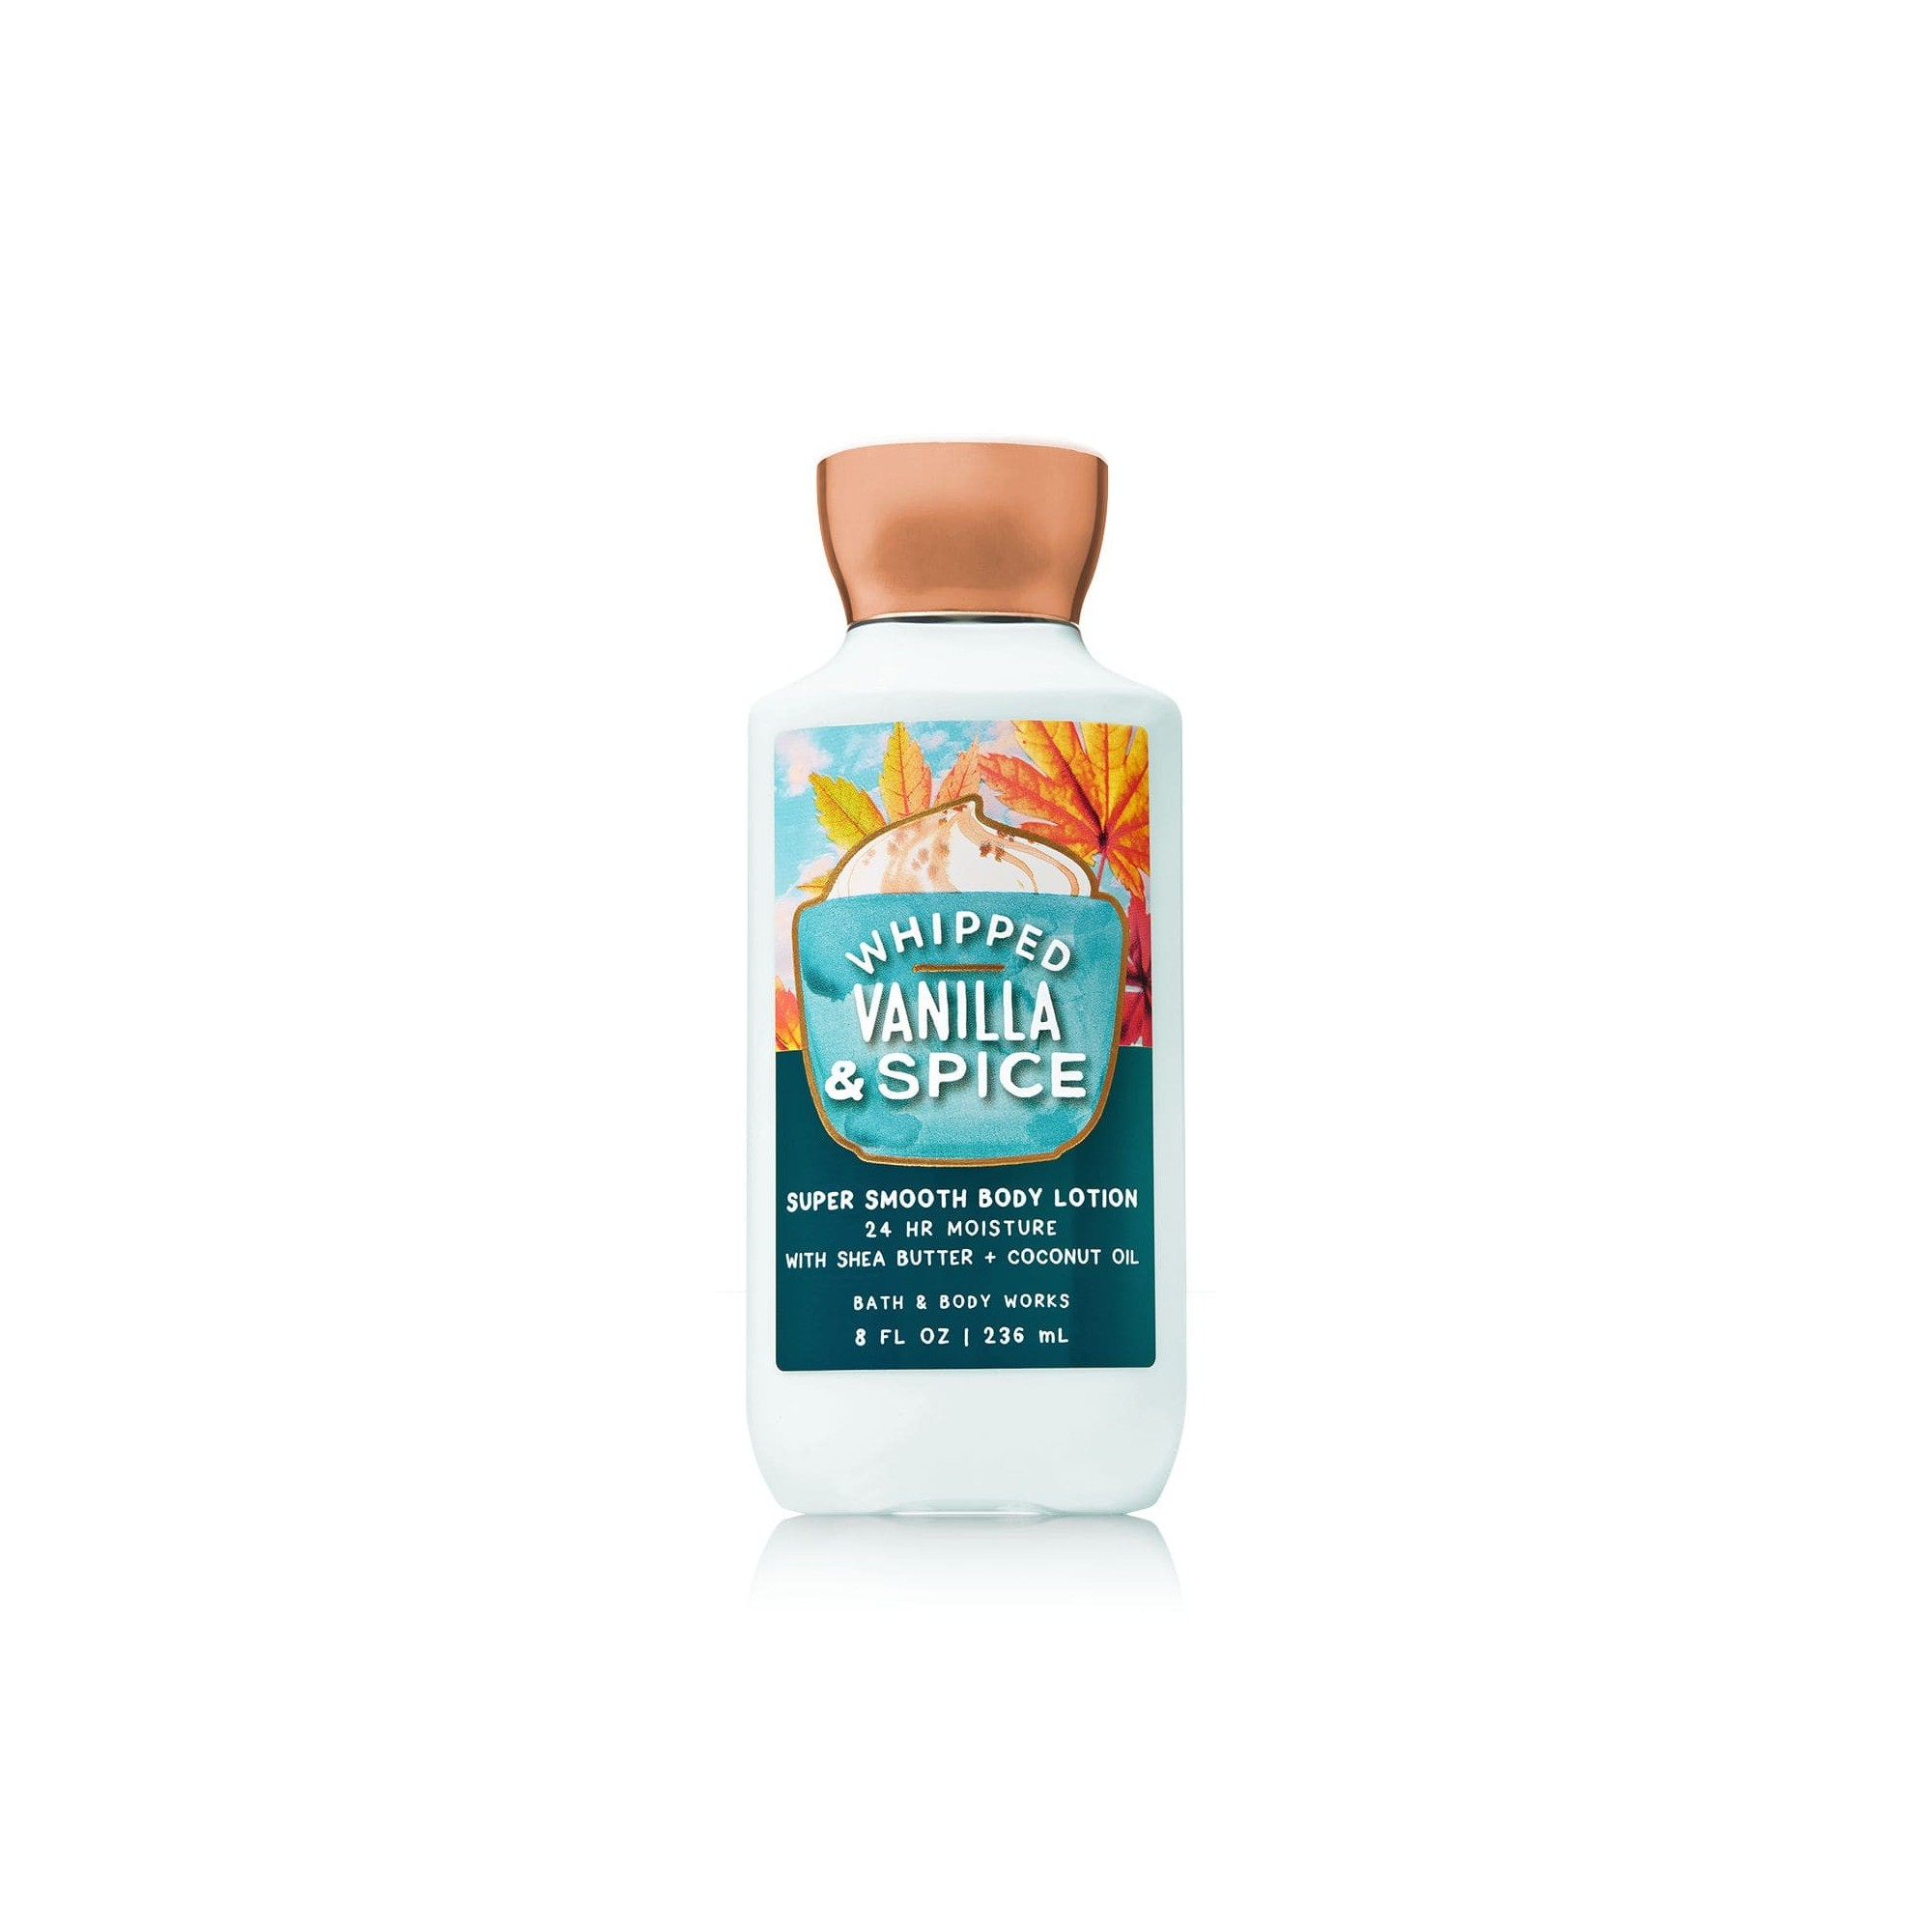 Bath & Body Works Whipped Vanilla & Spice Body Lotion